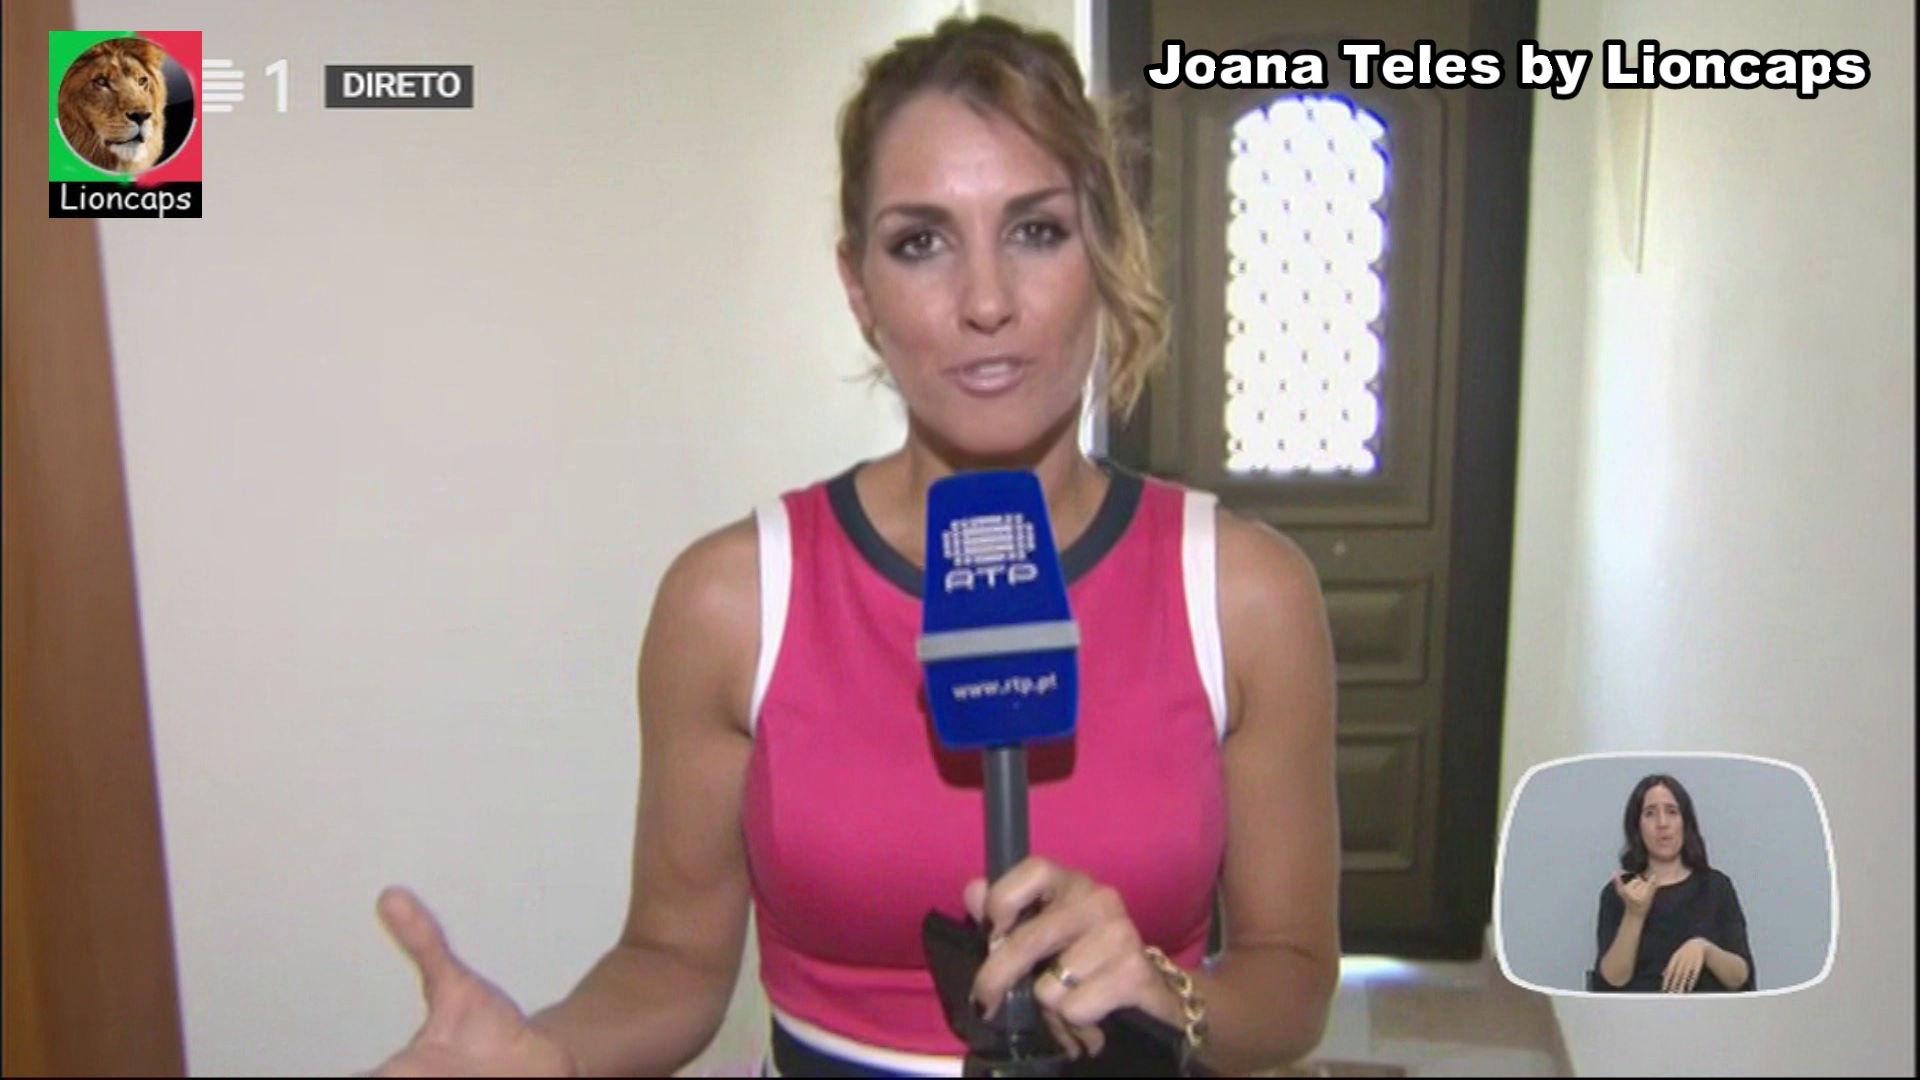 976664283_joana_teles_vs200125_1161_122_572lo.JPG